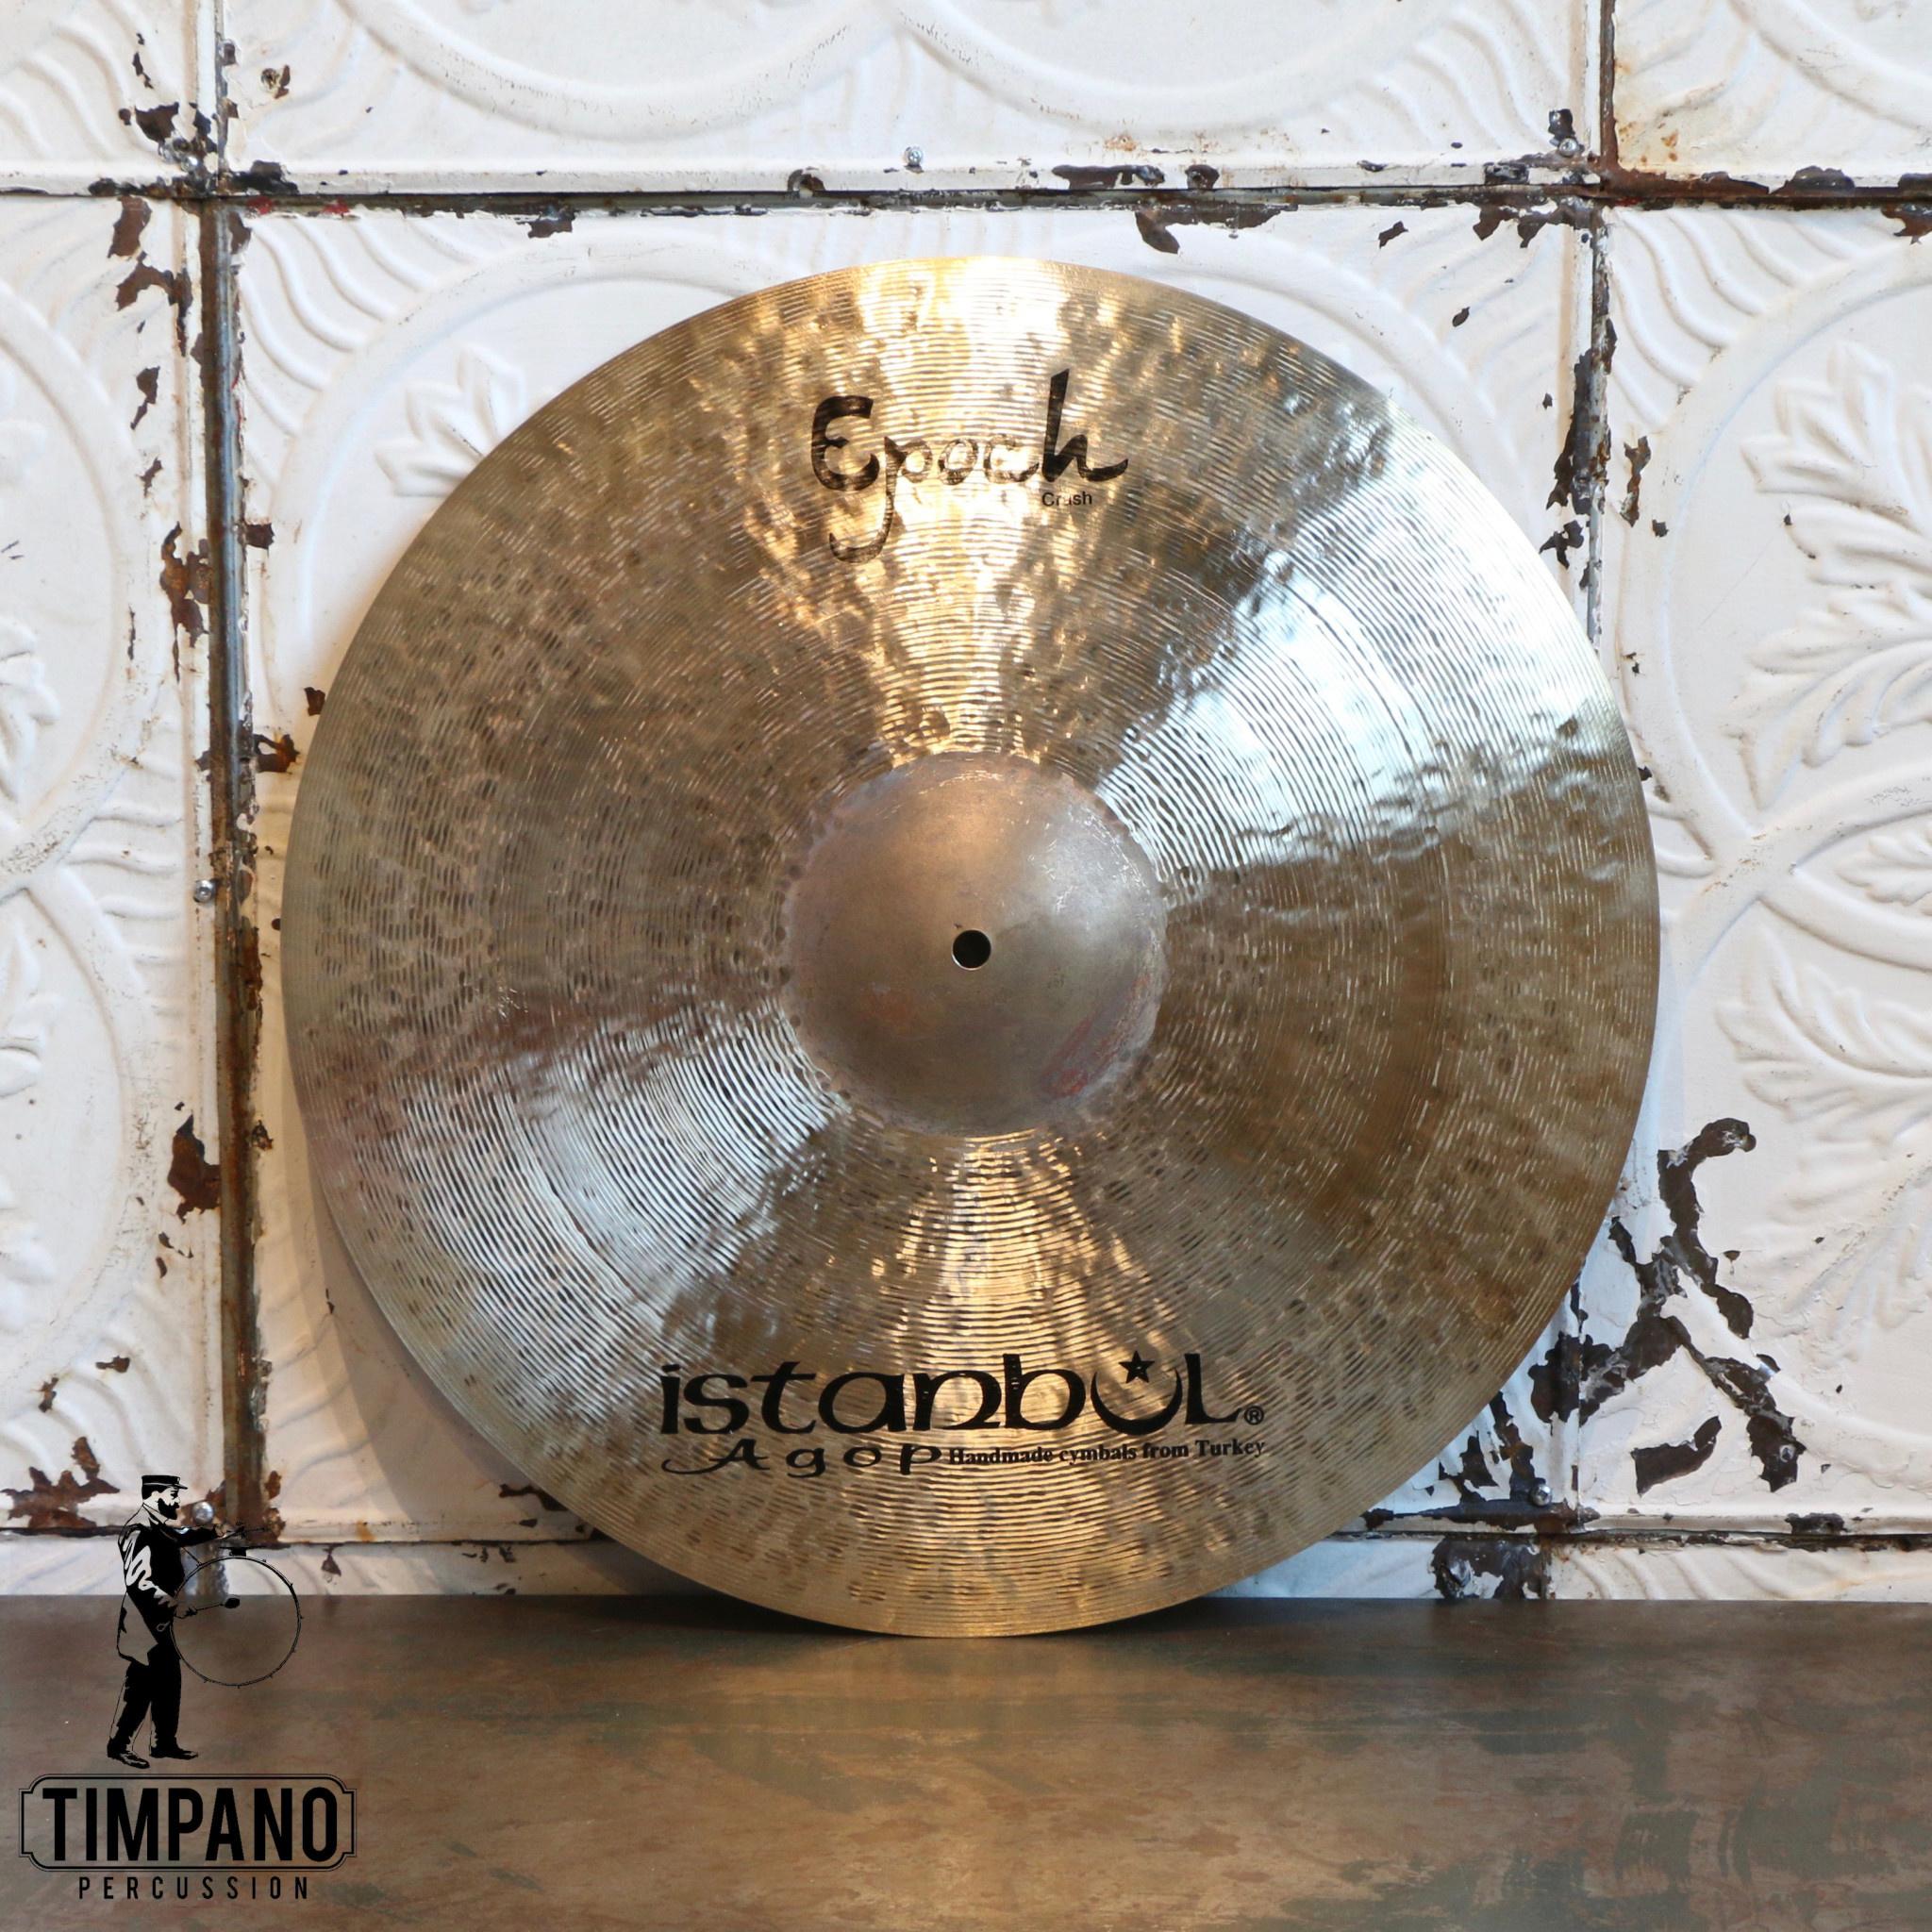 Istanbul Agop Cymbale crash Istanbul Agop Lenny White Epoch 19po